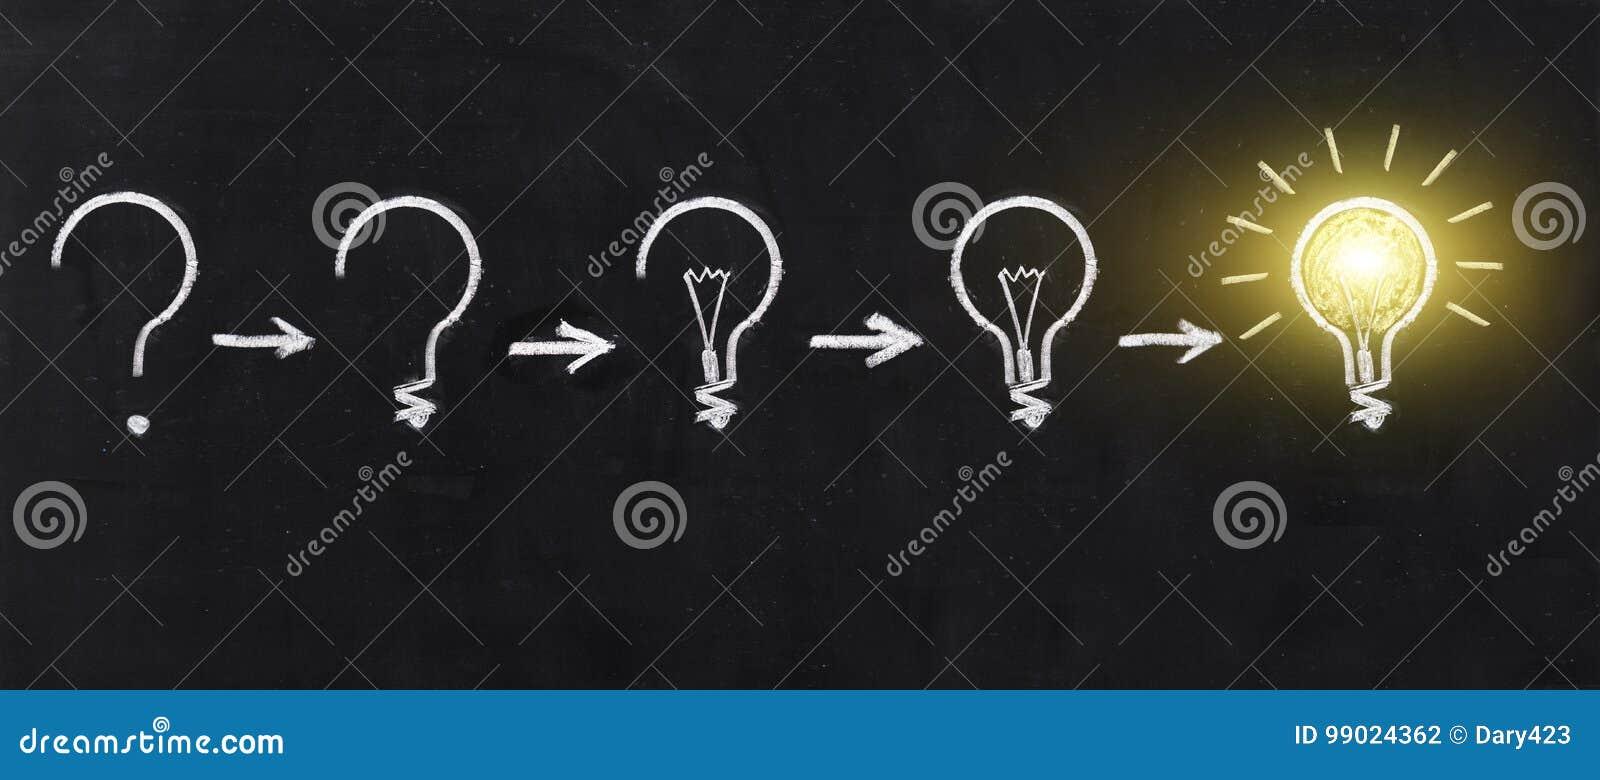 Black and white light bulb using doodle art on chalkboard background